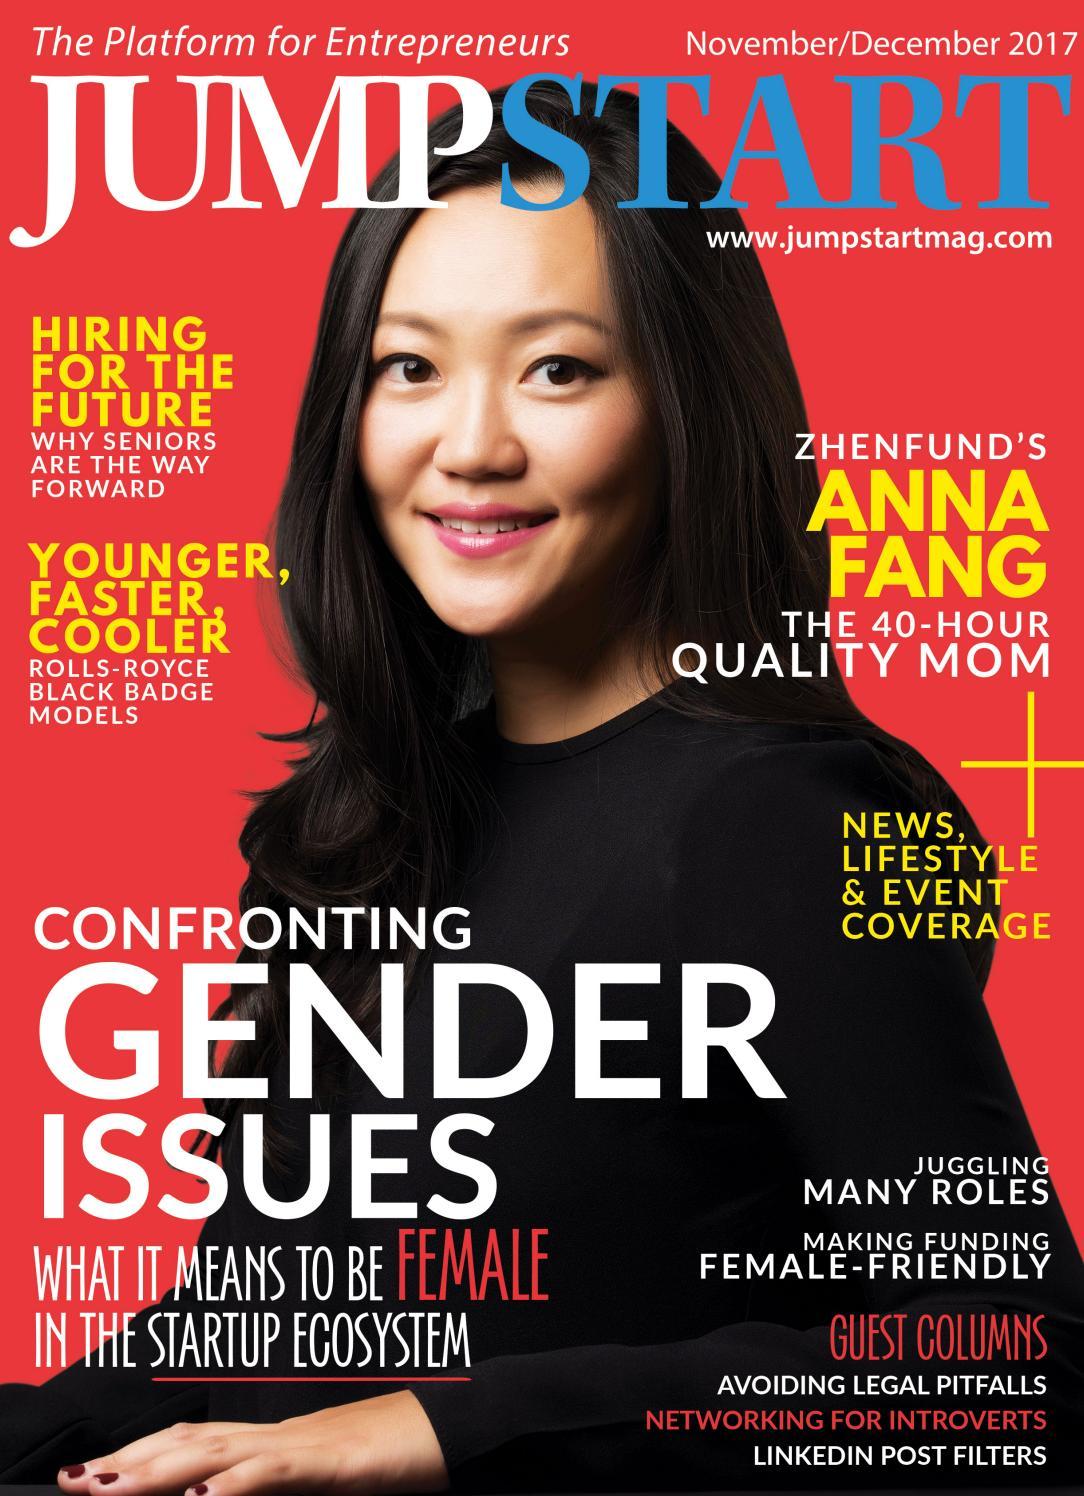 Startup Magazine of Hong Kong: Jumpstart Issue 18 (November/December